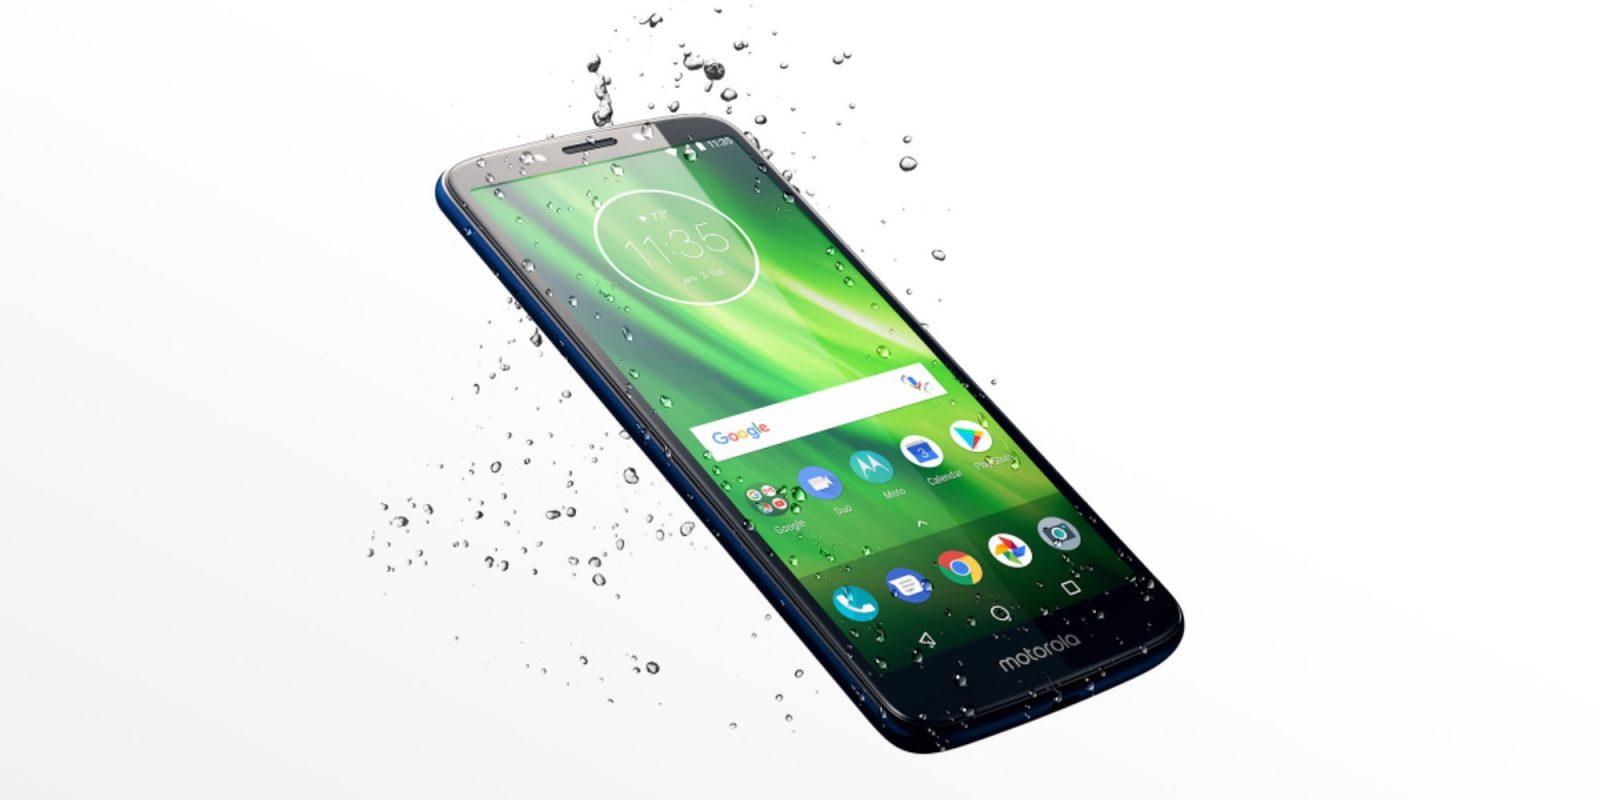 Take 25% off Motorola's Moto G6 Play Unlocked Android Smartphone at $150